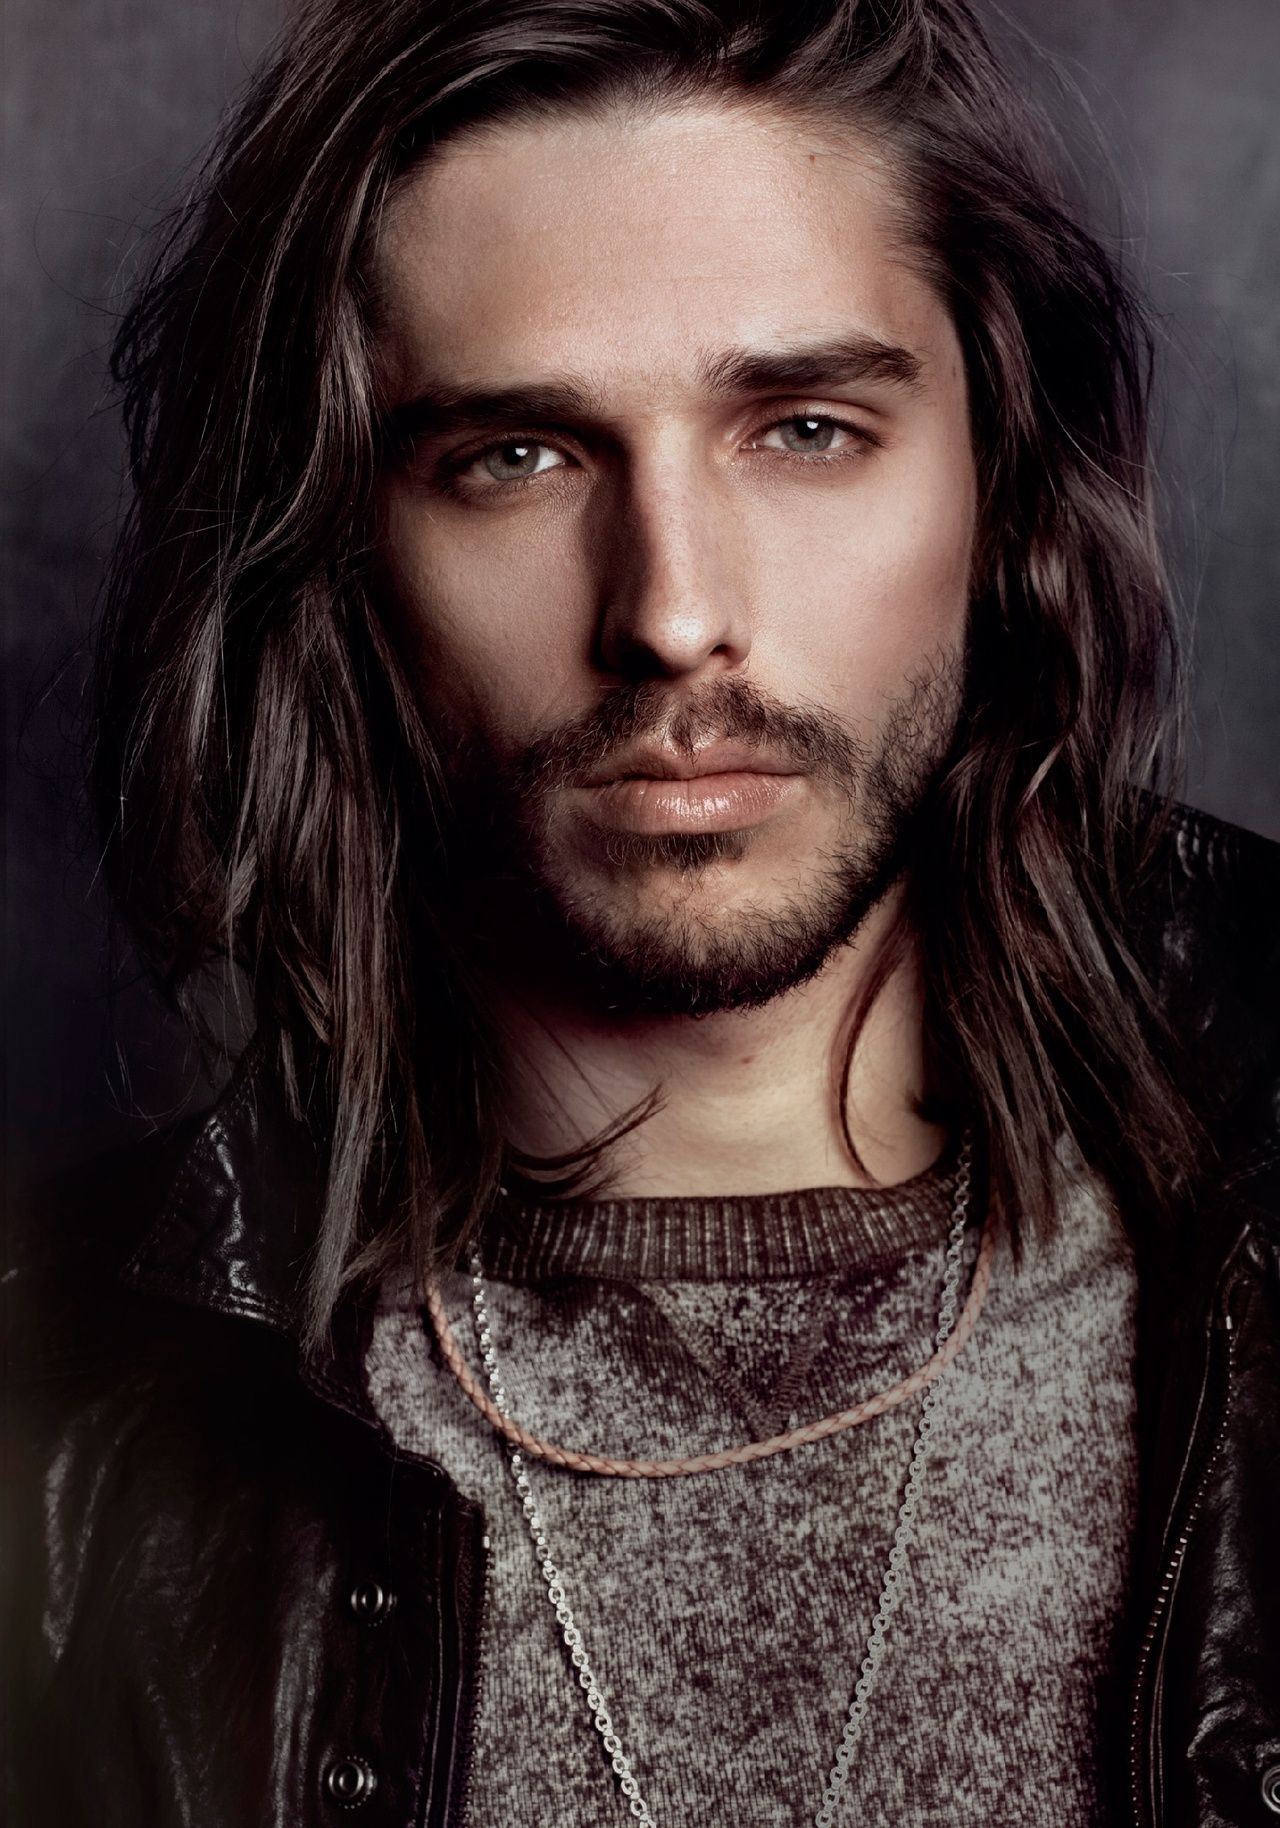 20 Classy Long Hairstyles For Men Long Hair Styles Men Beard Hairstyle Long Hair Styles